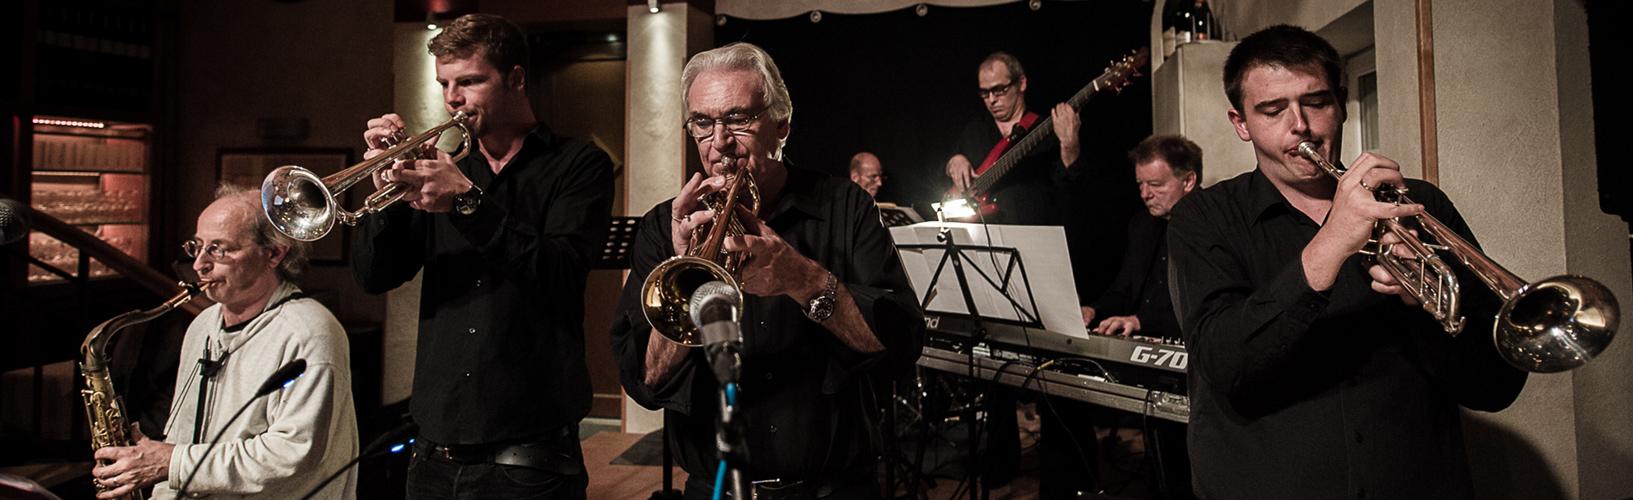 Klaus Heimann Horns Unlimited (Nachhol Konzert) Jazzclub Hamm Hoppegarden Foto Steff Apperdannier